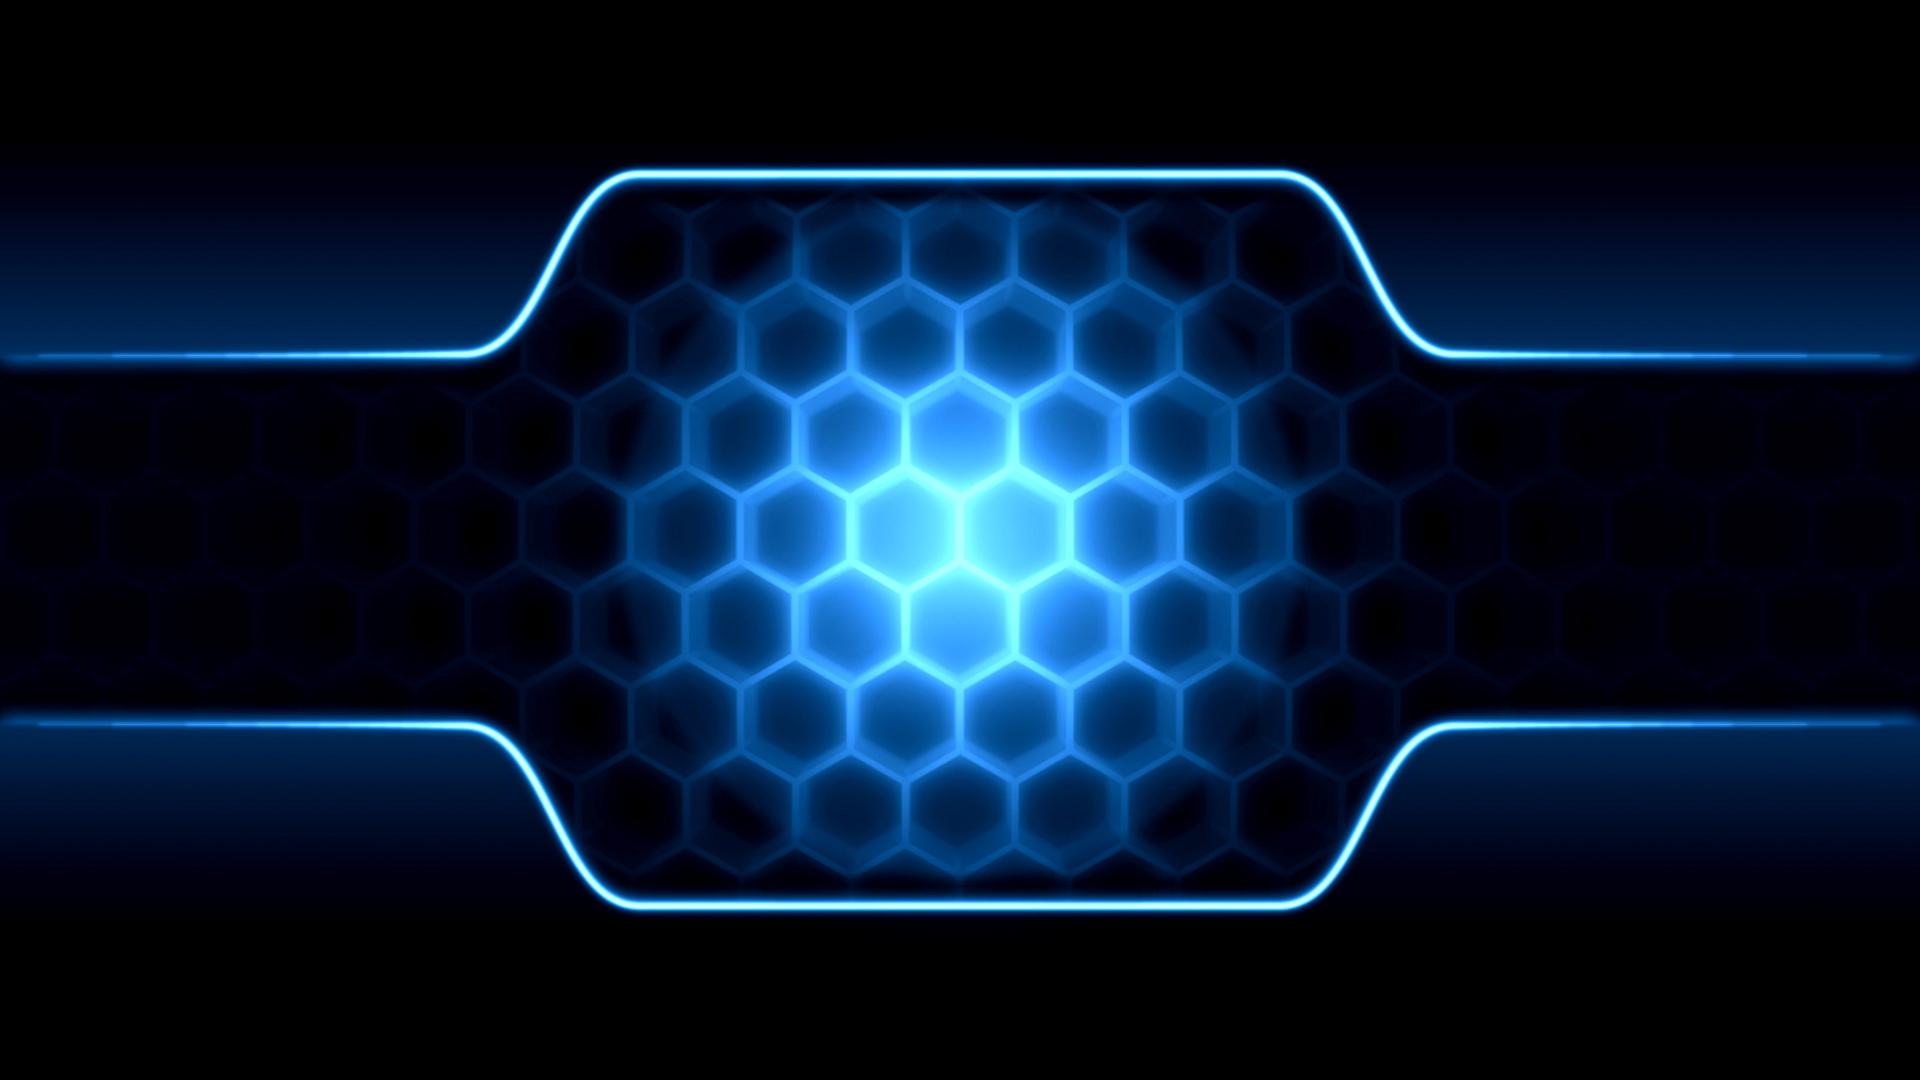 powercore explore powercore on deviantart